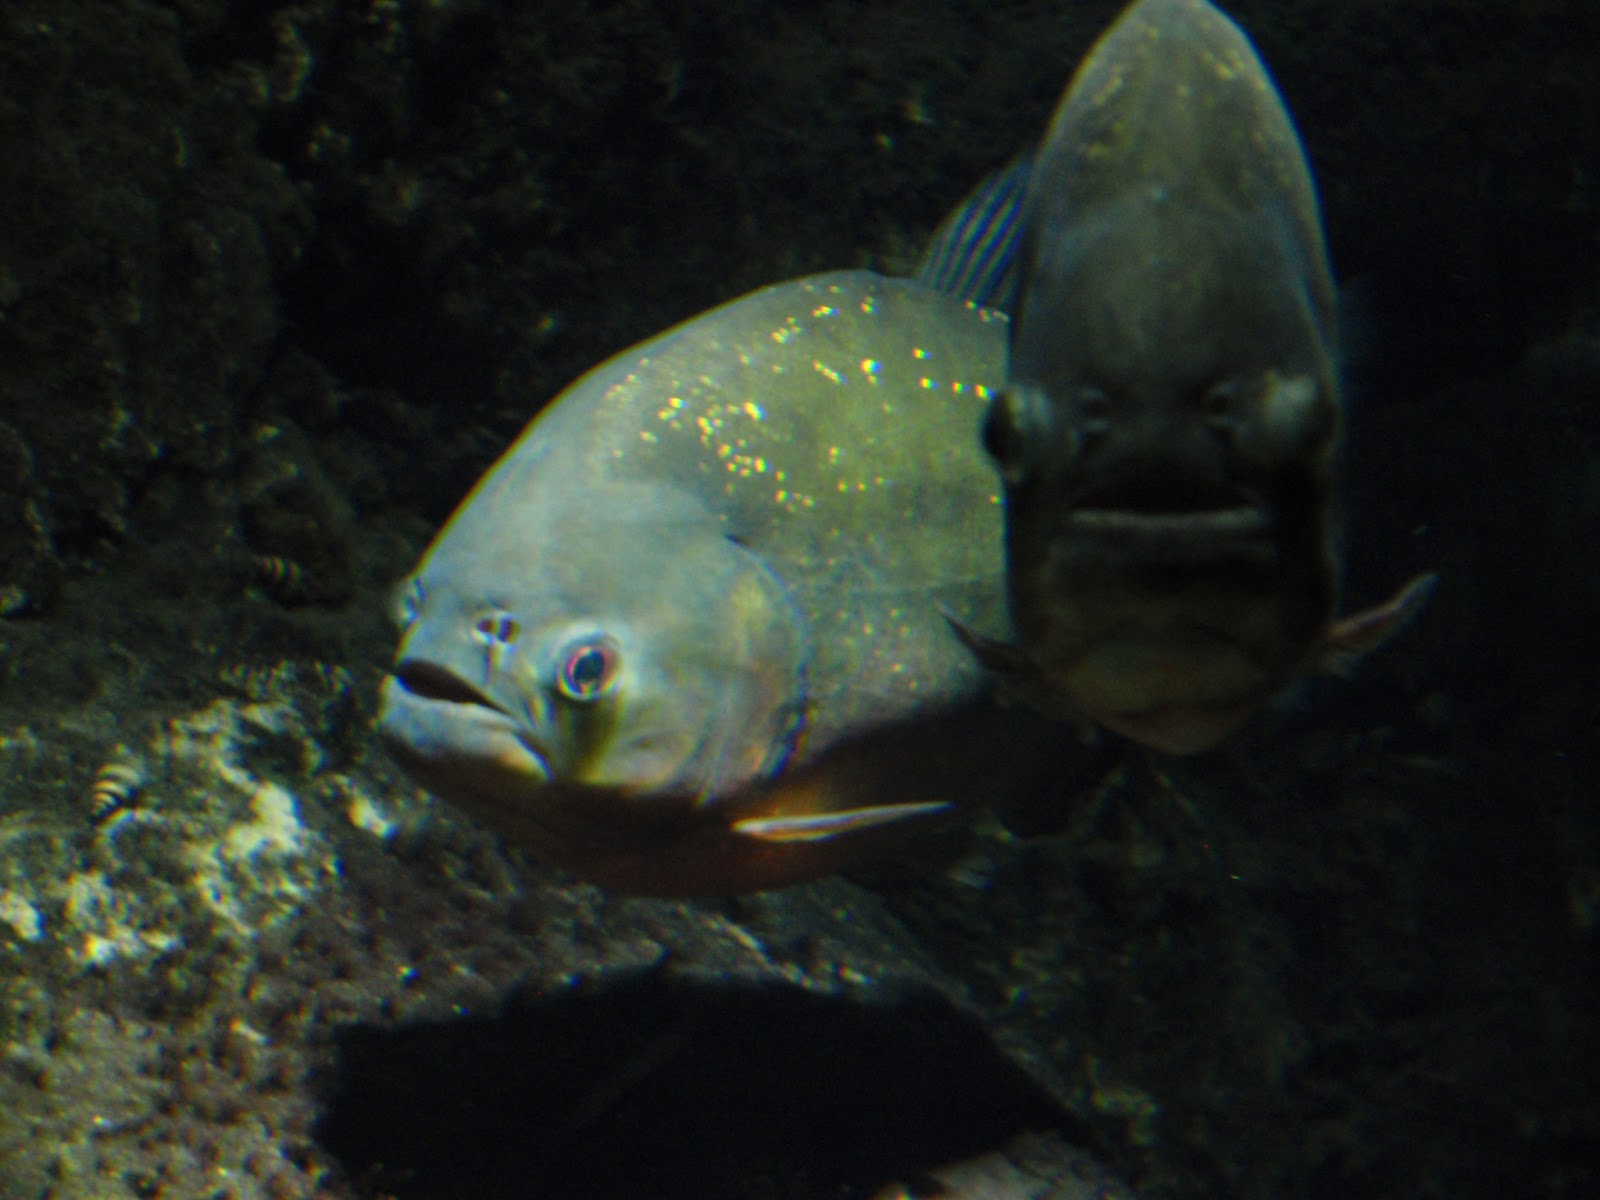 Weird wonderful bristol aquarium for What fish has eyelids